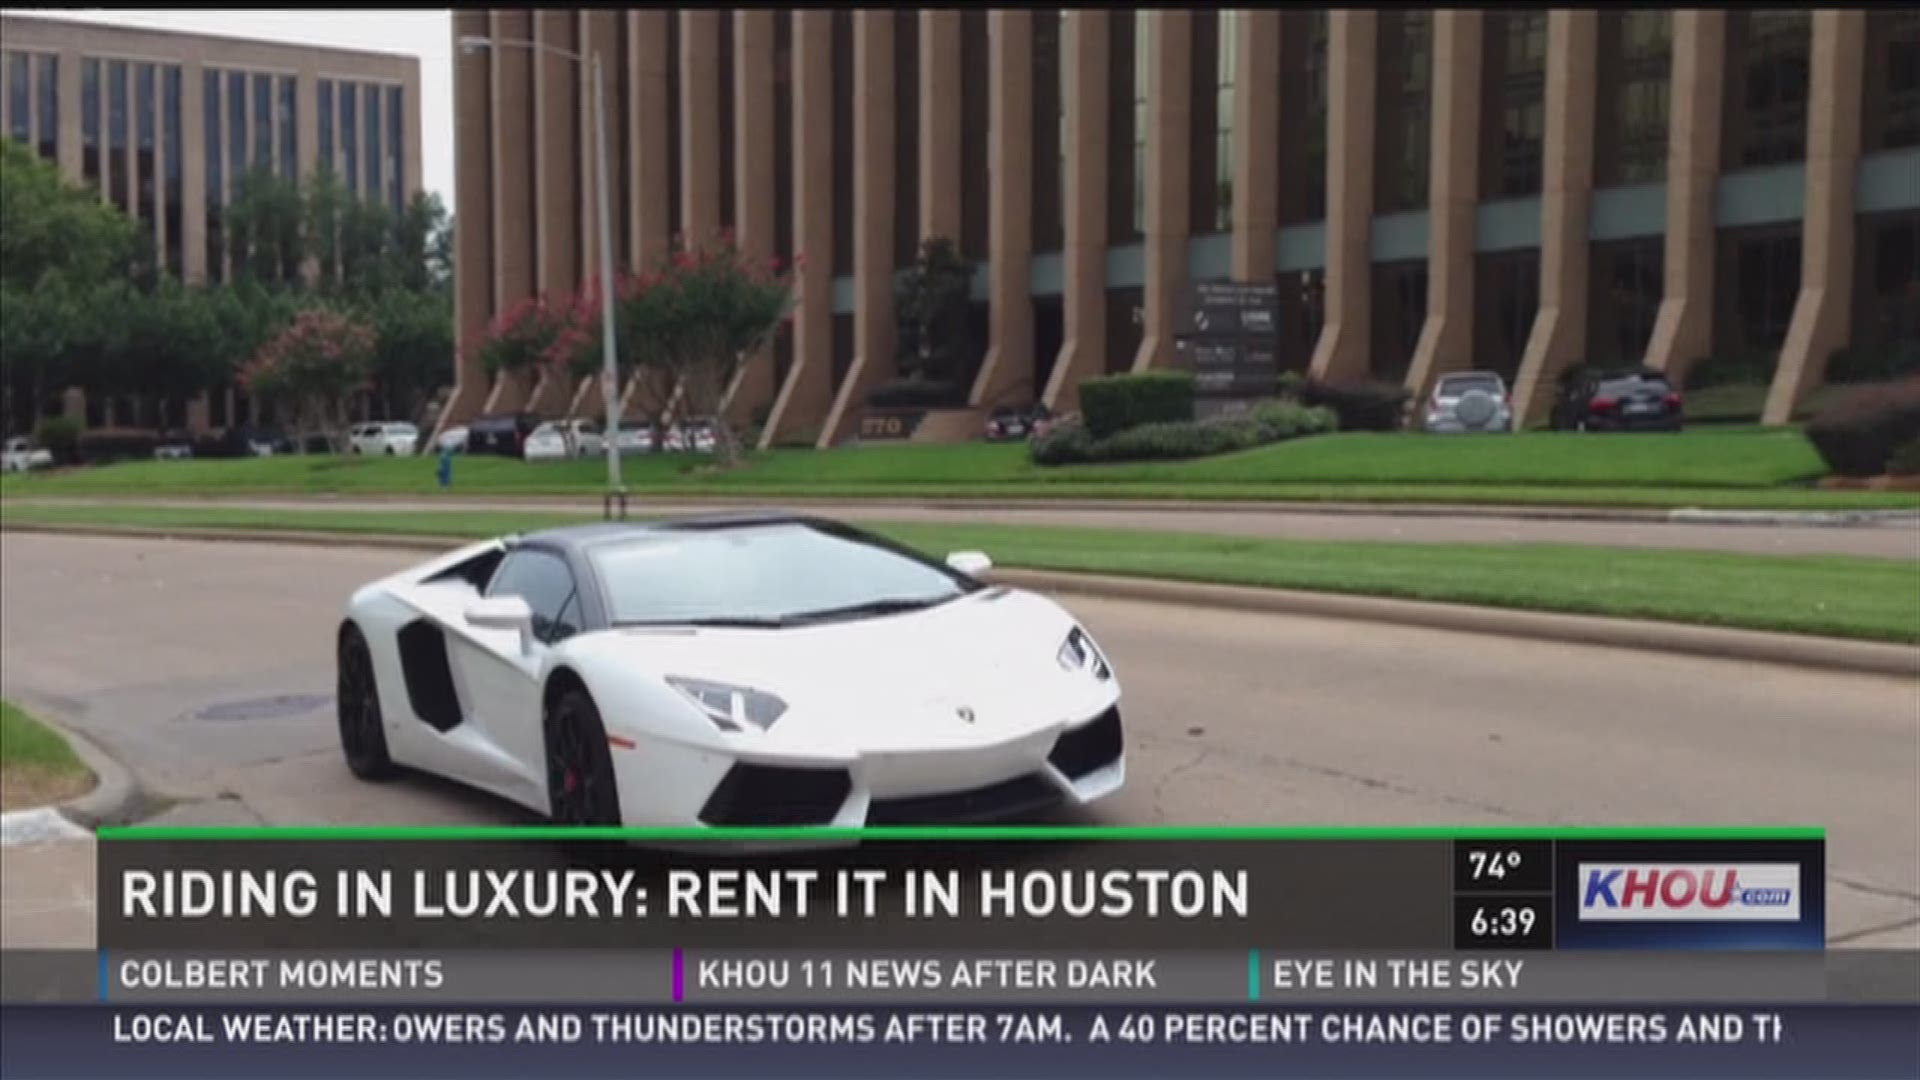 lamborghini houston best cars nero car stitch date miles super rental noctis coupe price low texas a rent in branding release contrast